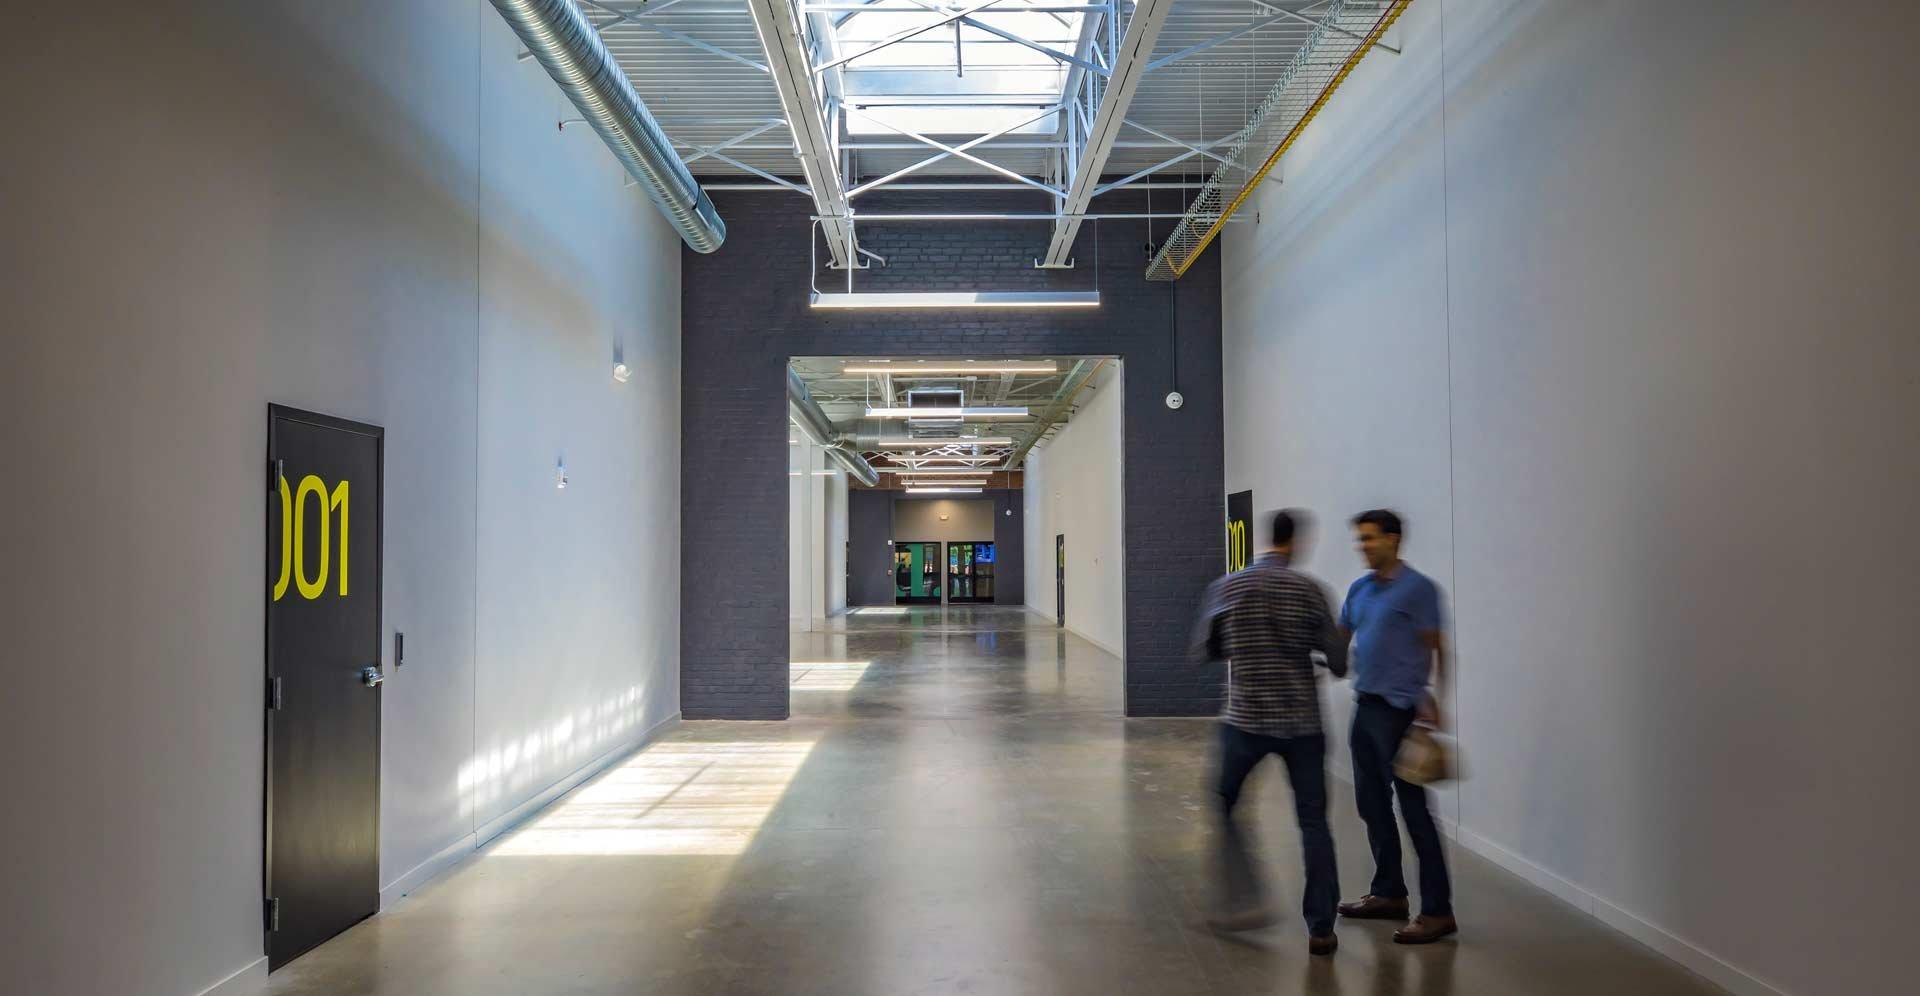 District-02-hallway.jpg